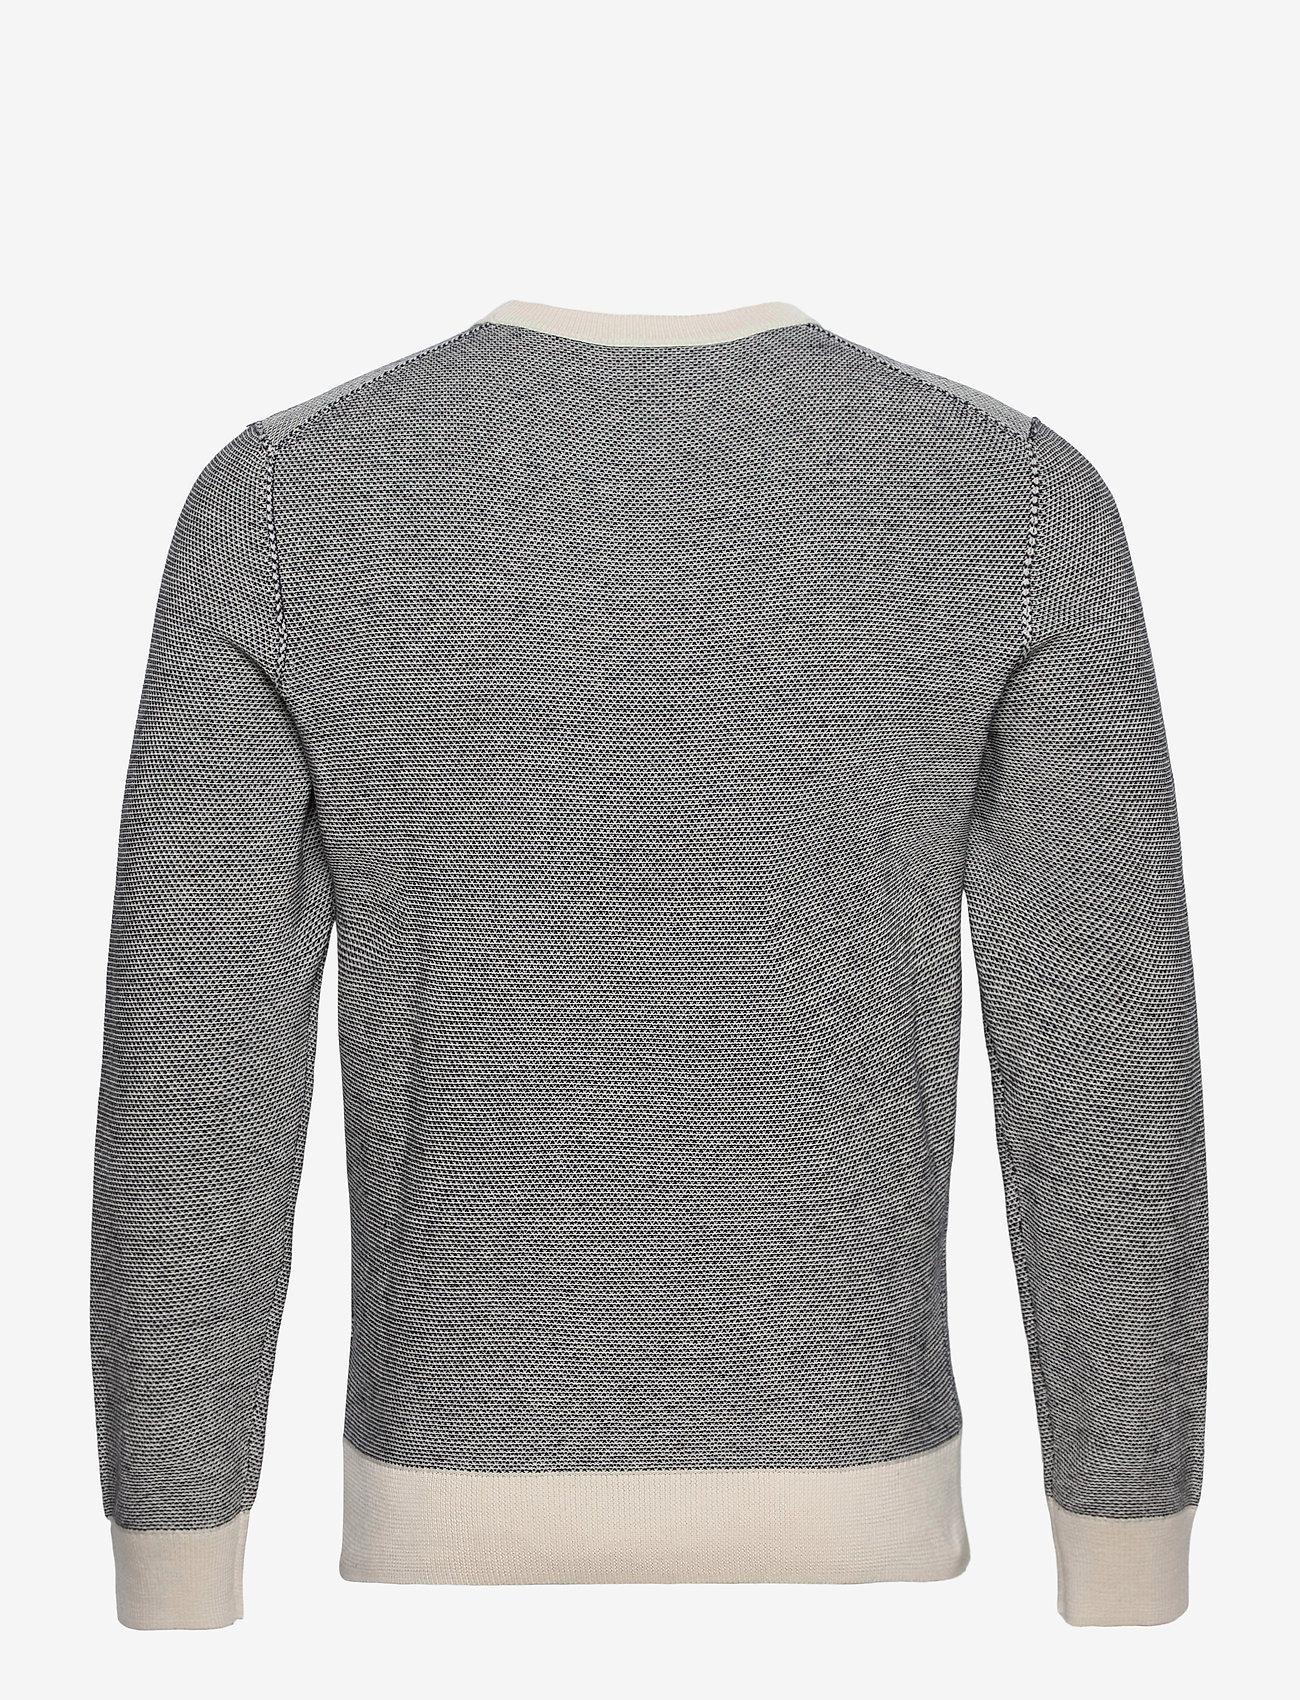 BOSS - Kamarsos - tricots basiques - light beige - 1